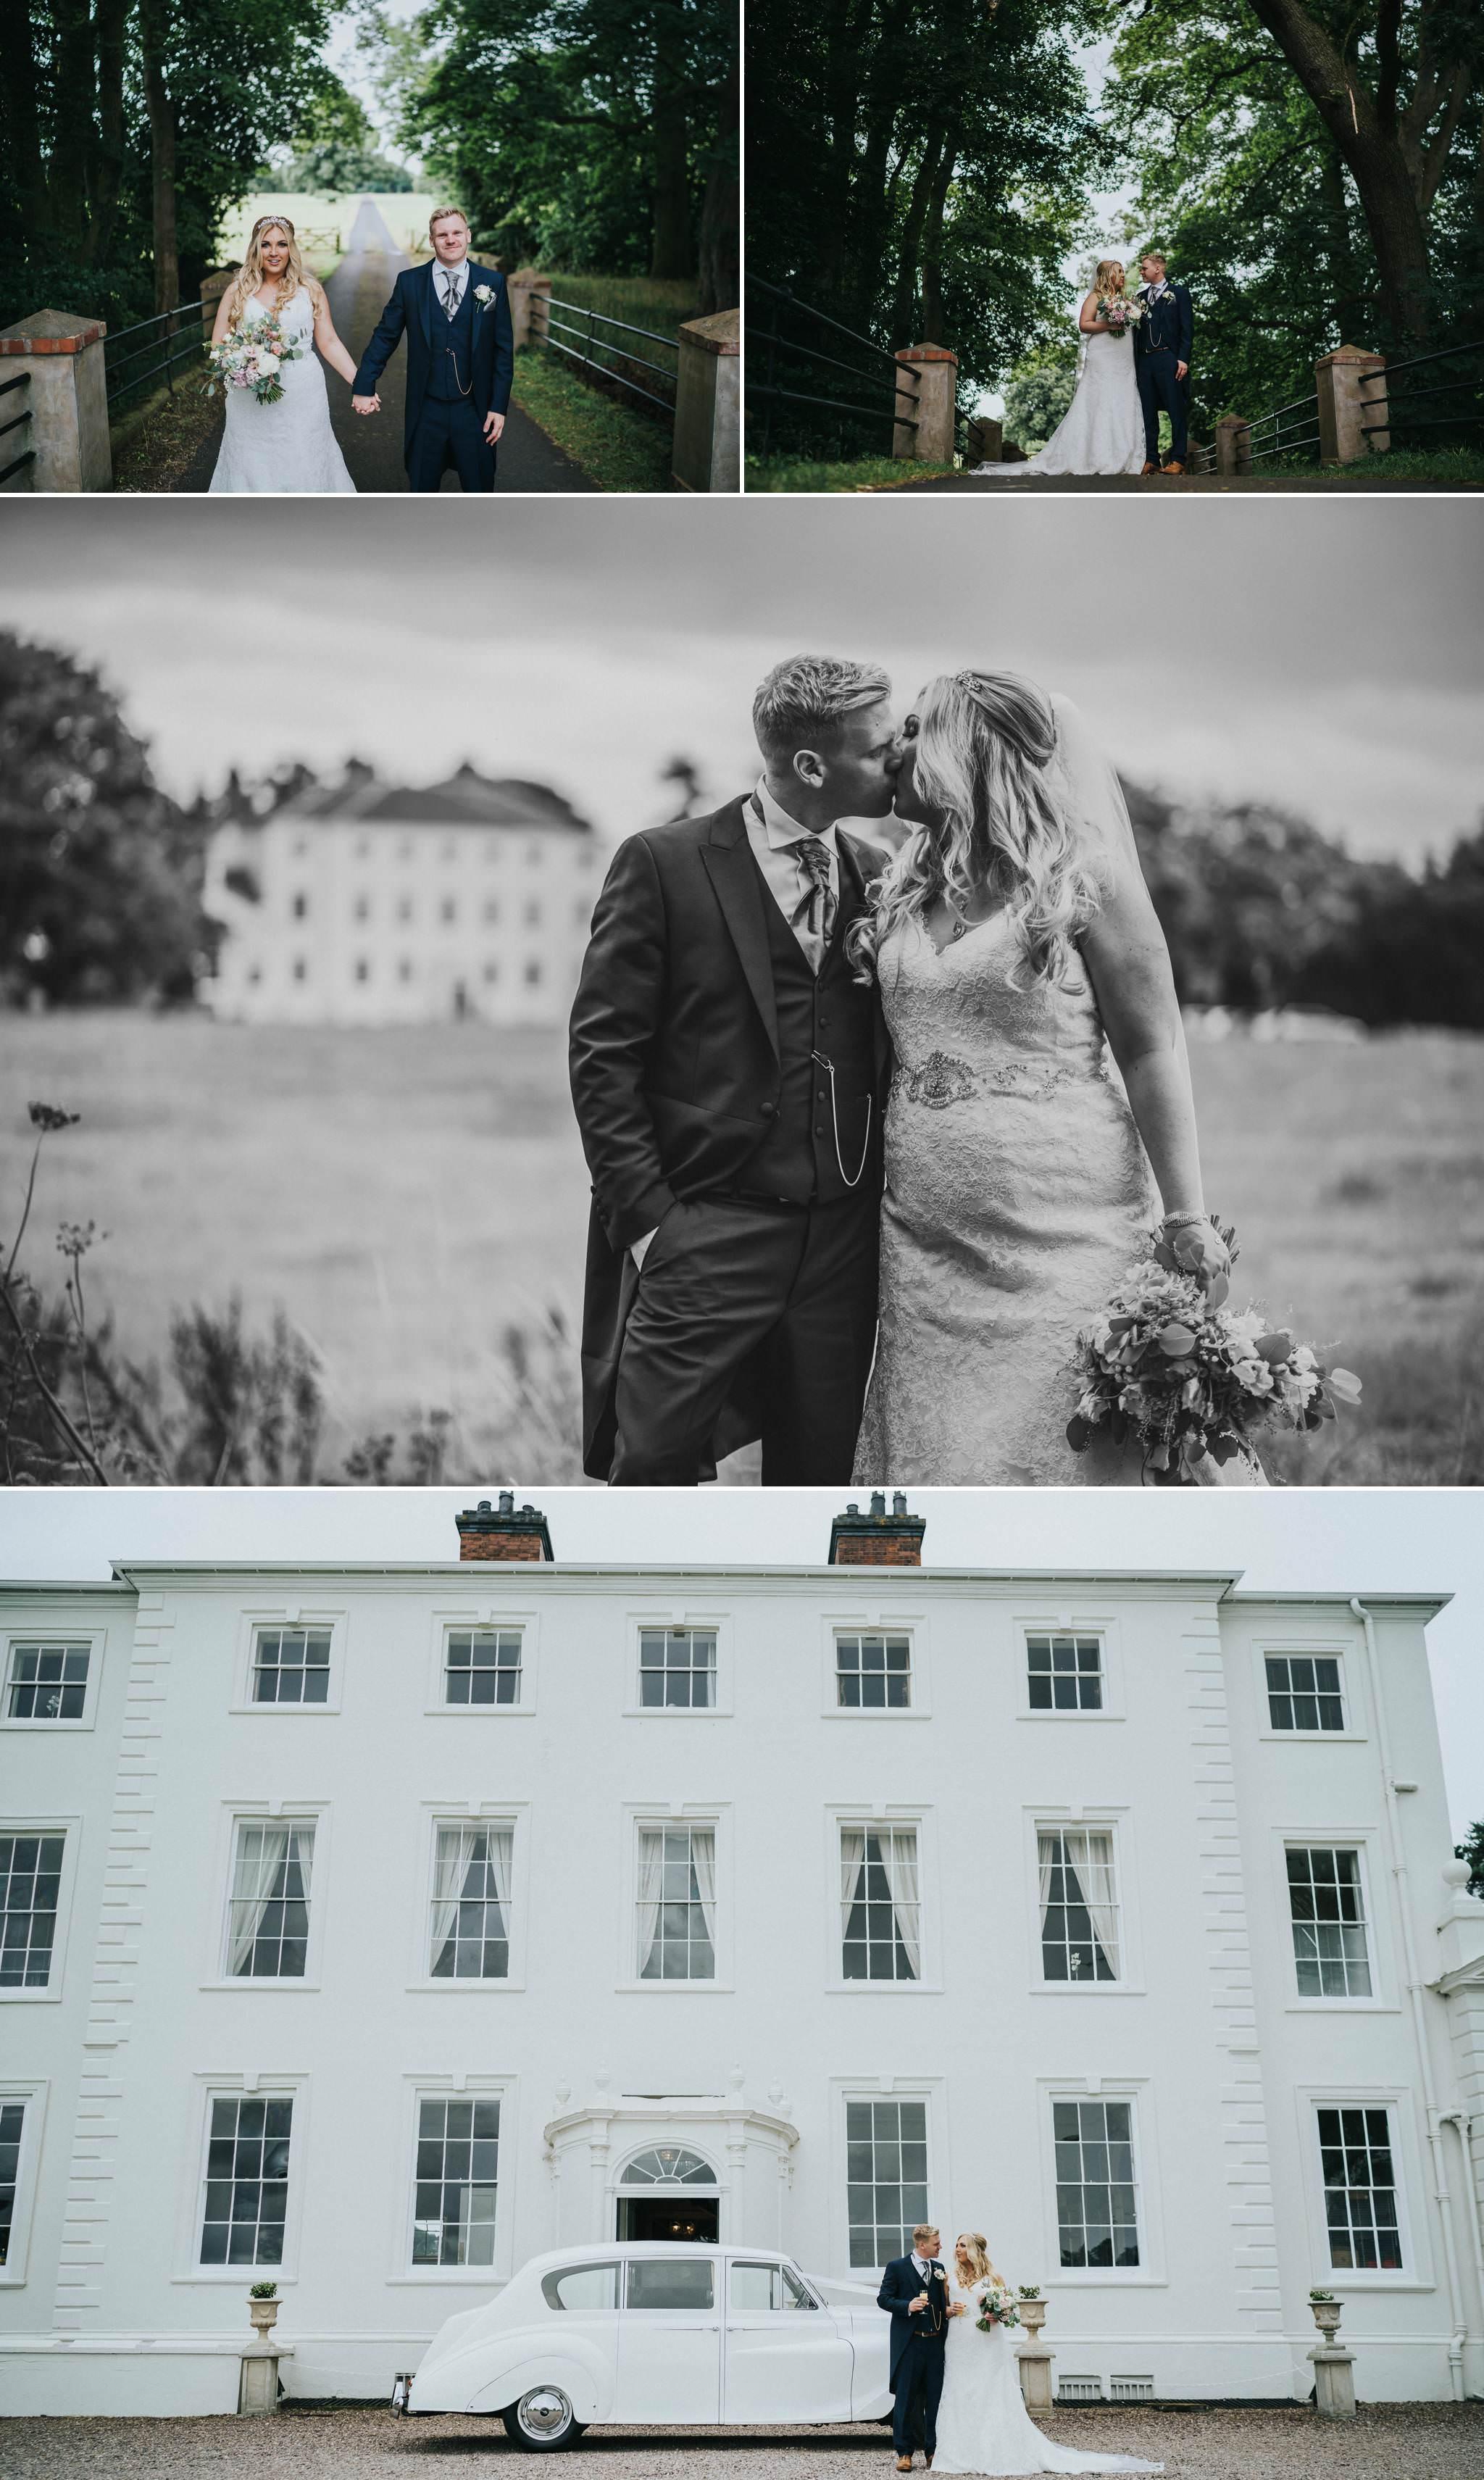 somerford-hall-wedding-photography 13.jpg